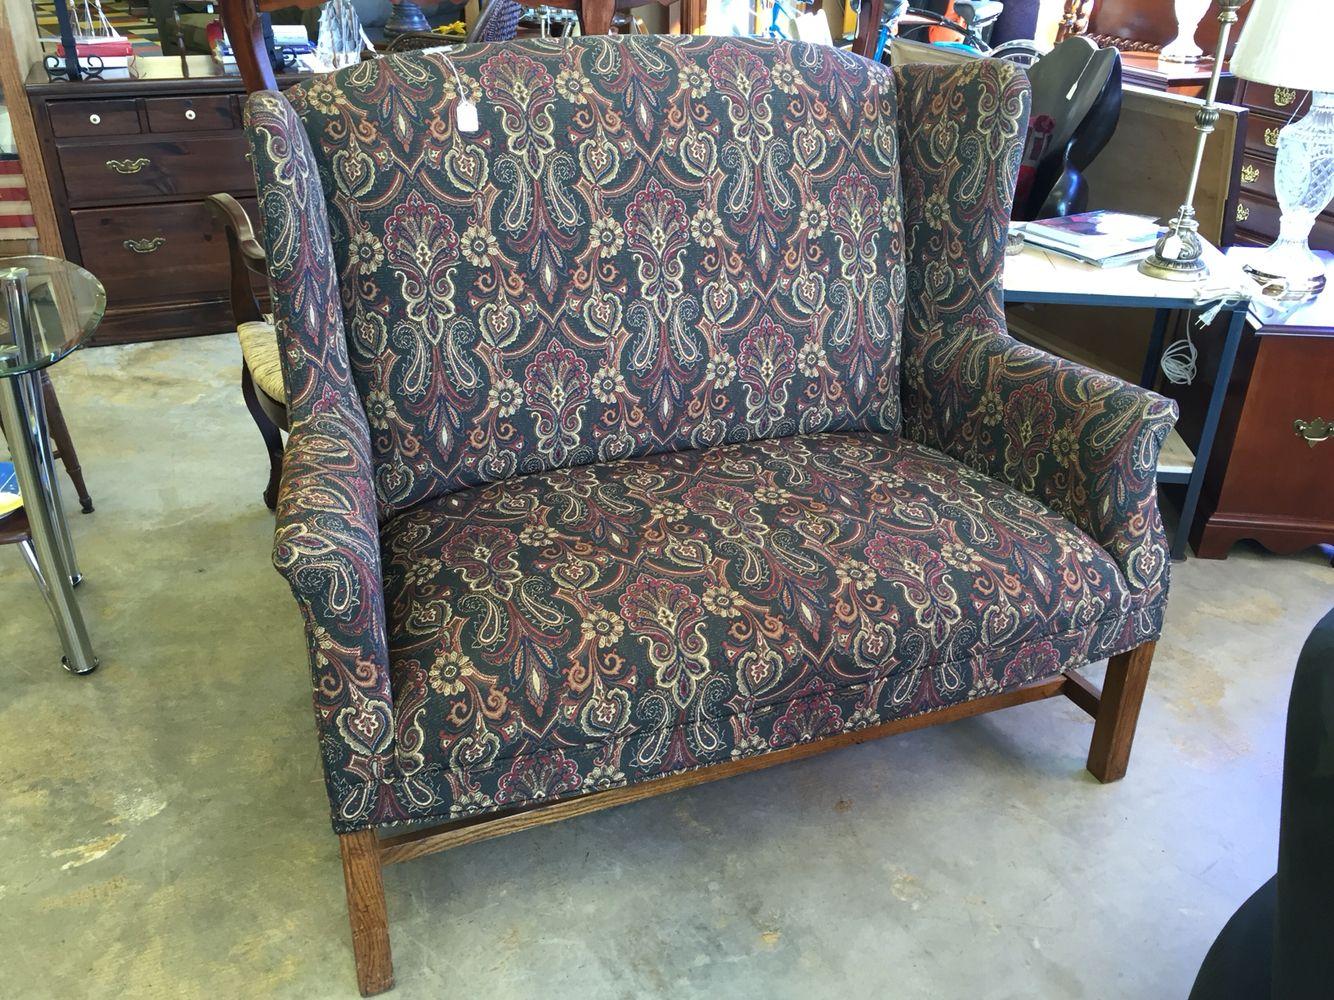 Download Wallpaper Used Patio Furniture For Sale In Wichita